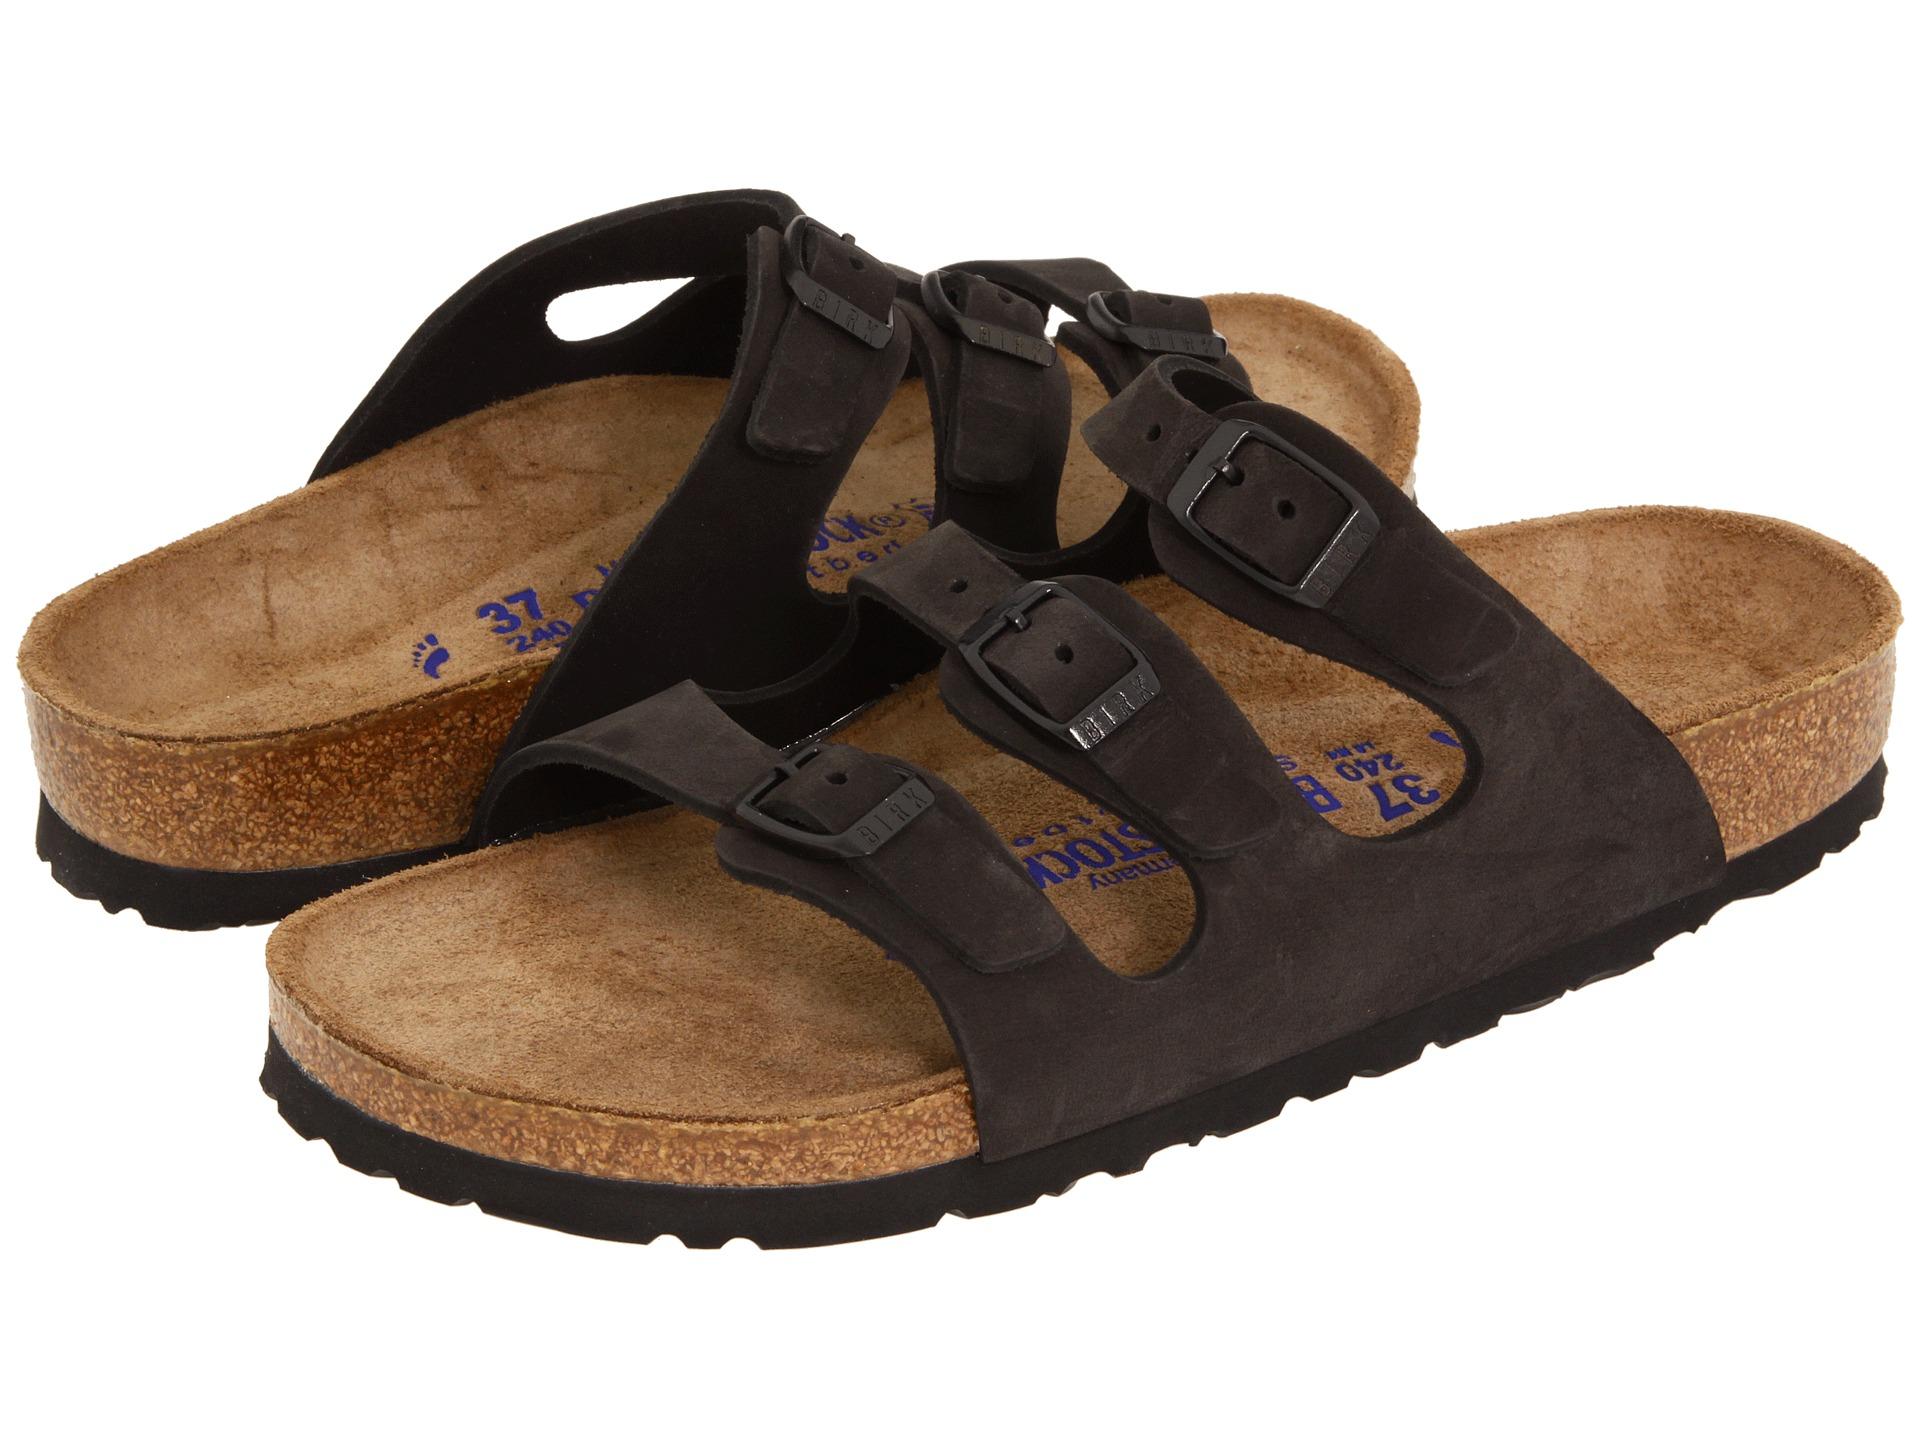 Black nubuck sandals - Birkenstock Florida Soft Footbed Nubuck Zappos Com Free Shipping Both Ways